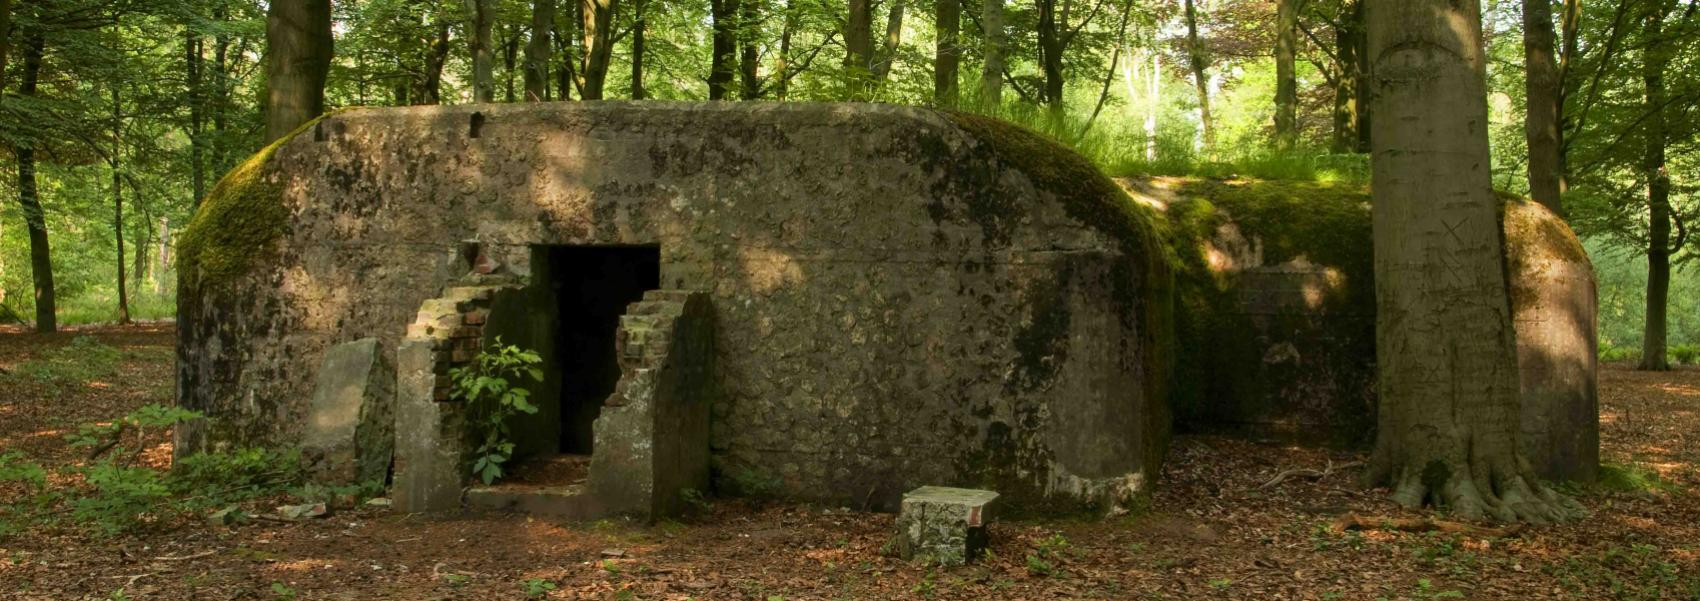 bunker in het bos